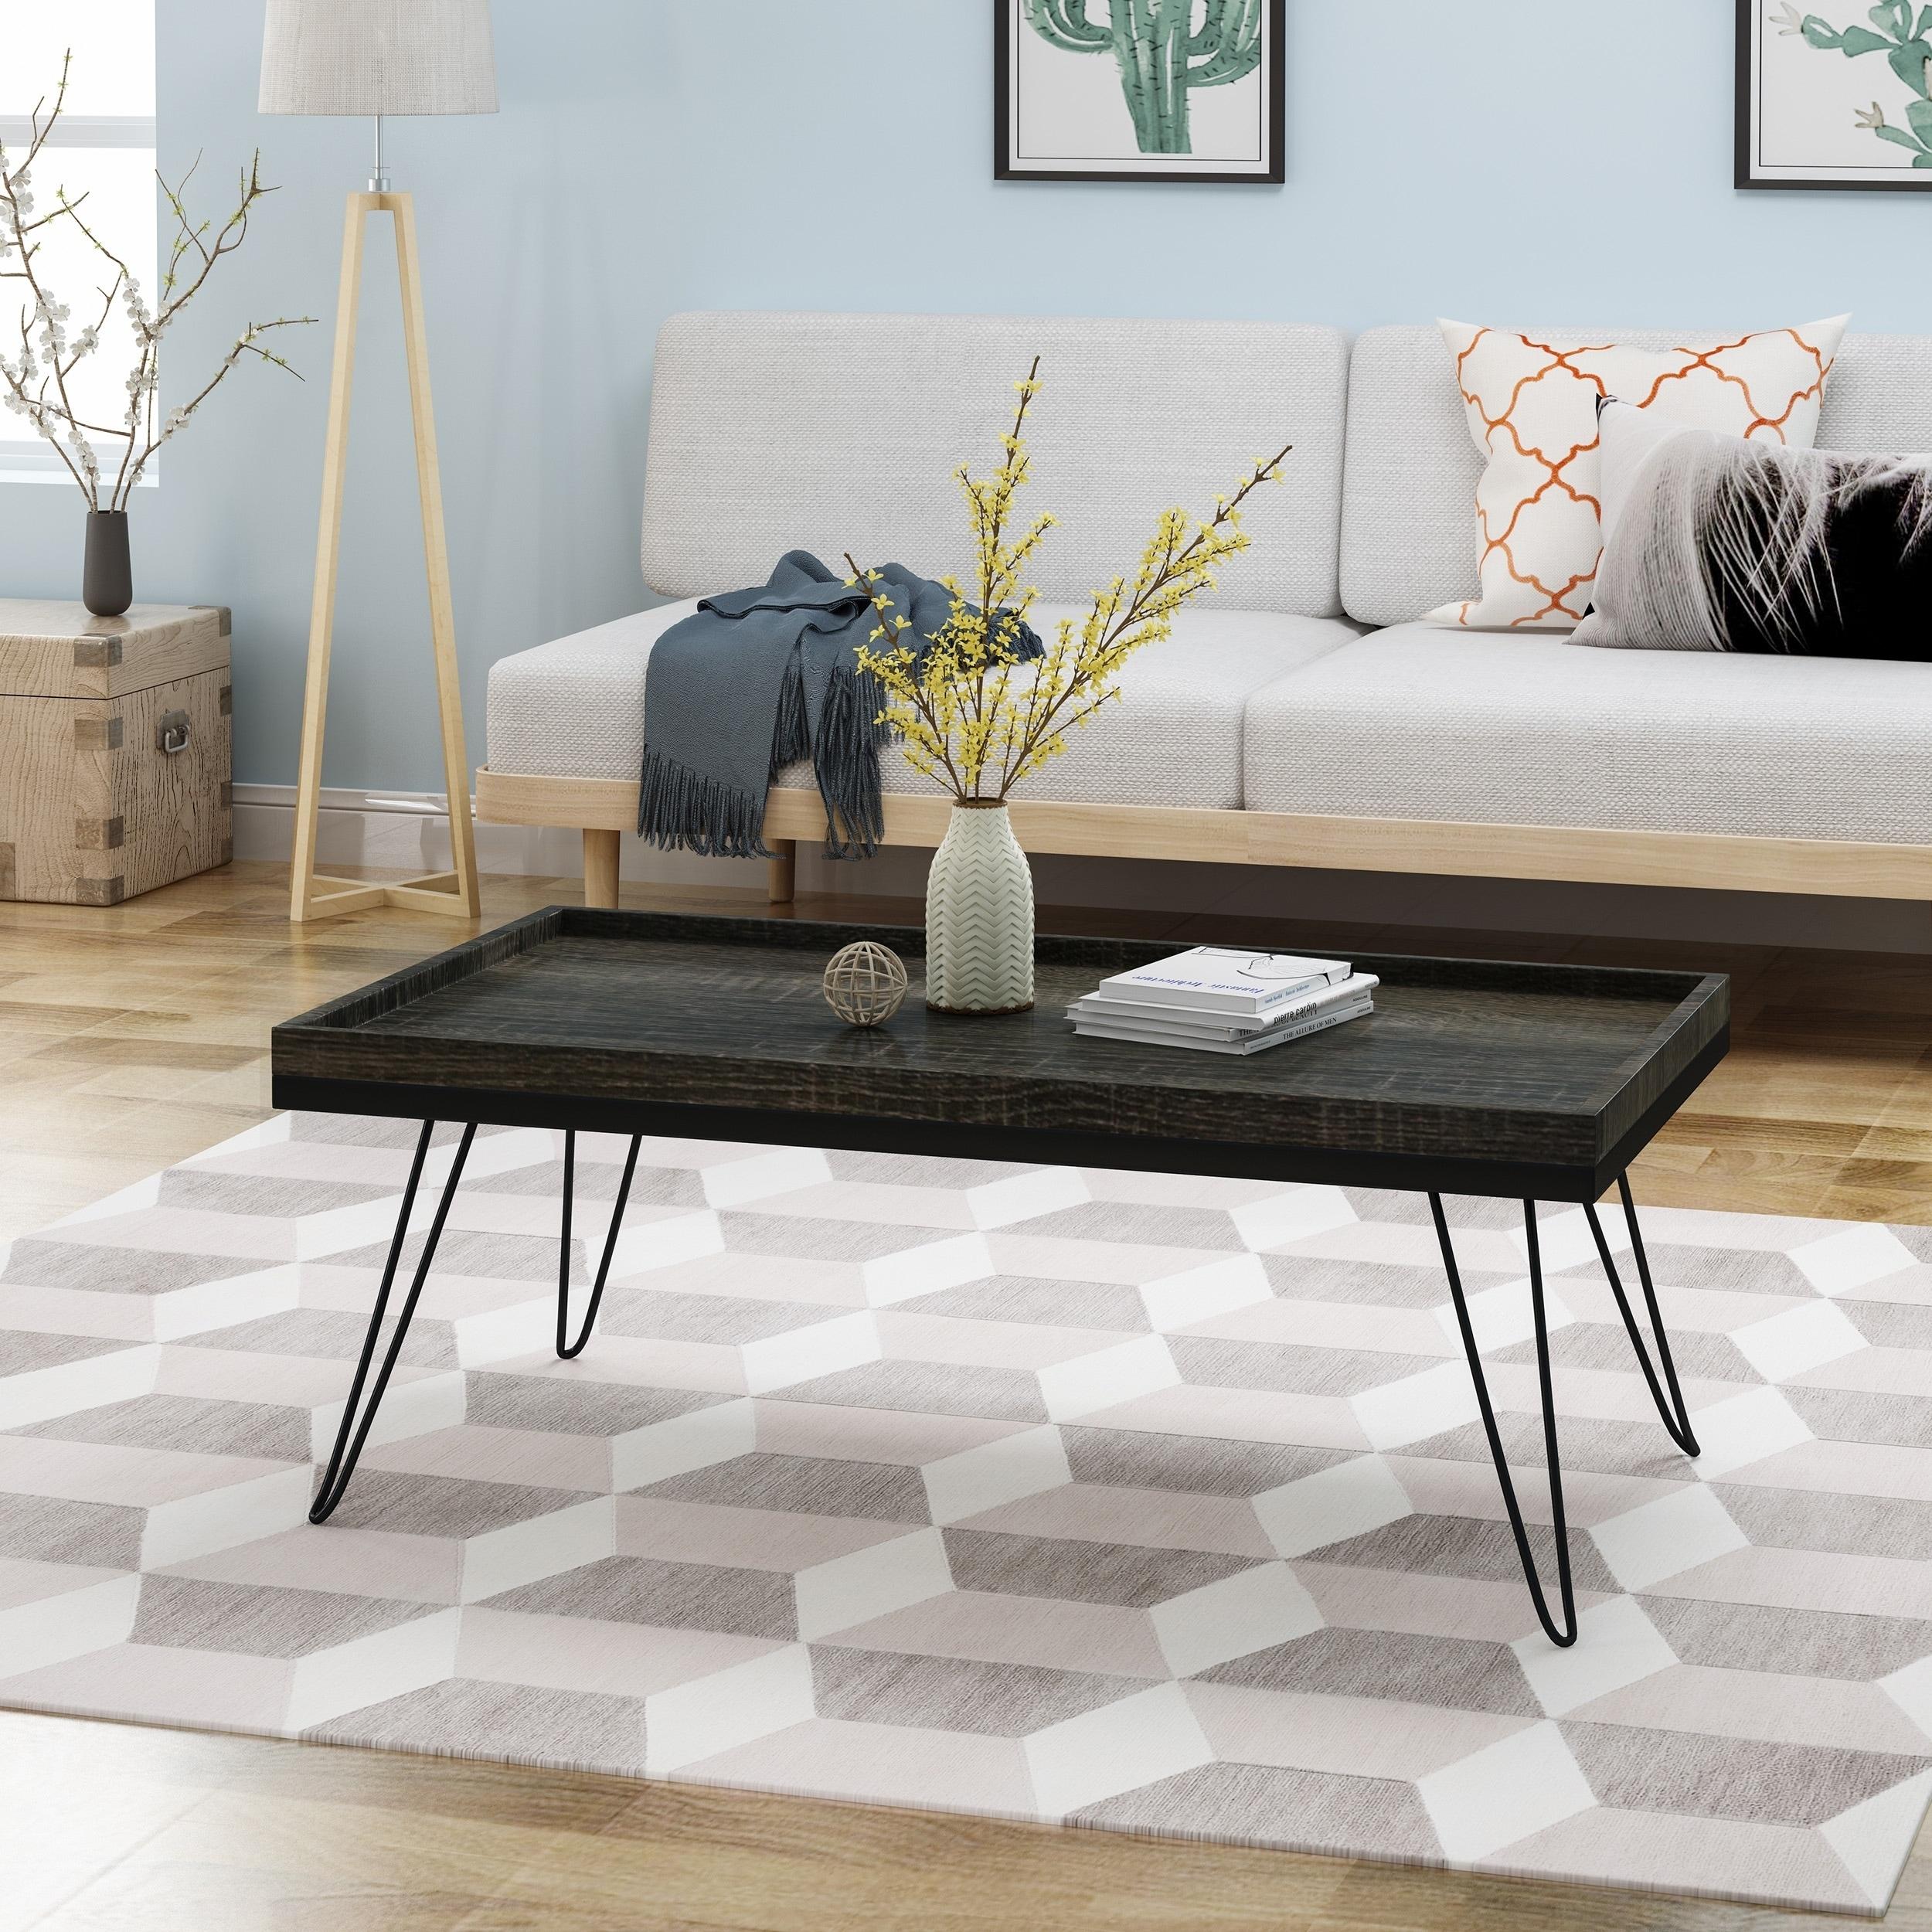 Hairpin Leg Coffee Table.Seminole Industrial Modern Coffee Table With Hairpin Legs By Christopher Knight Home